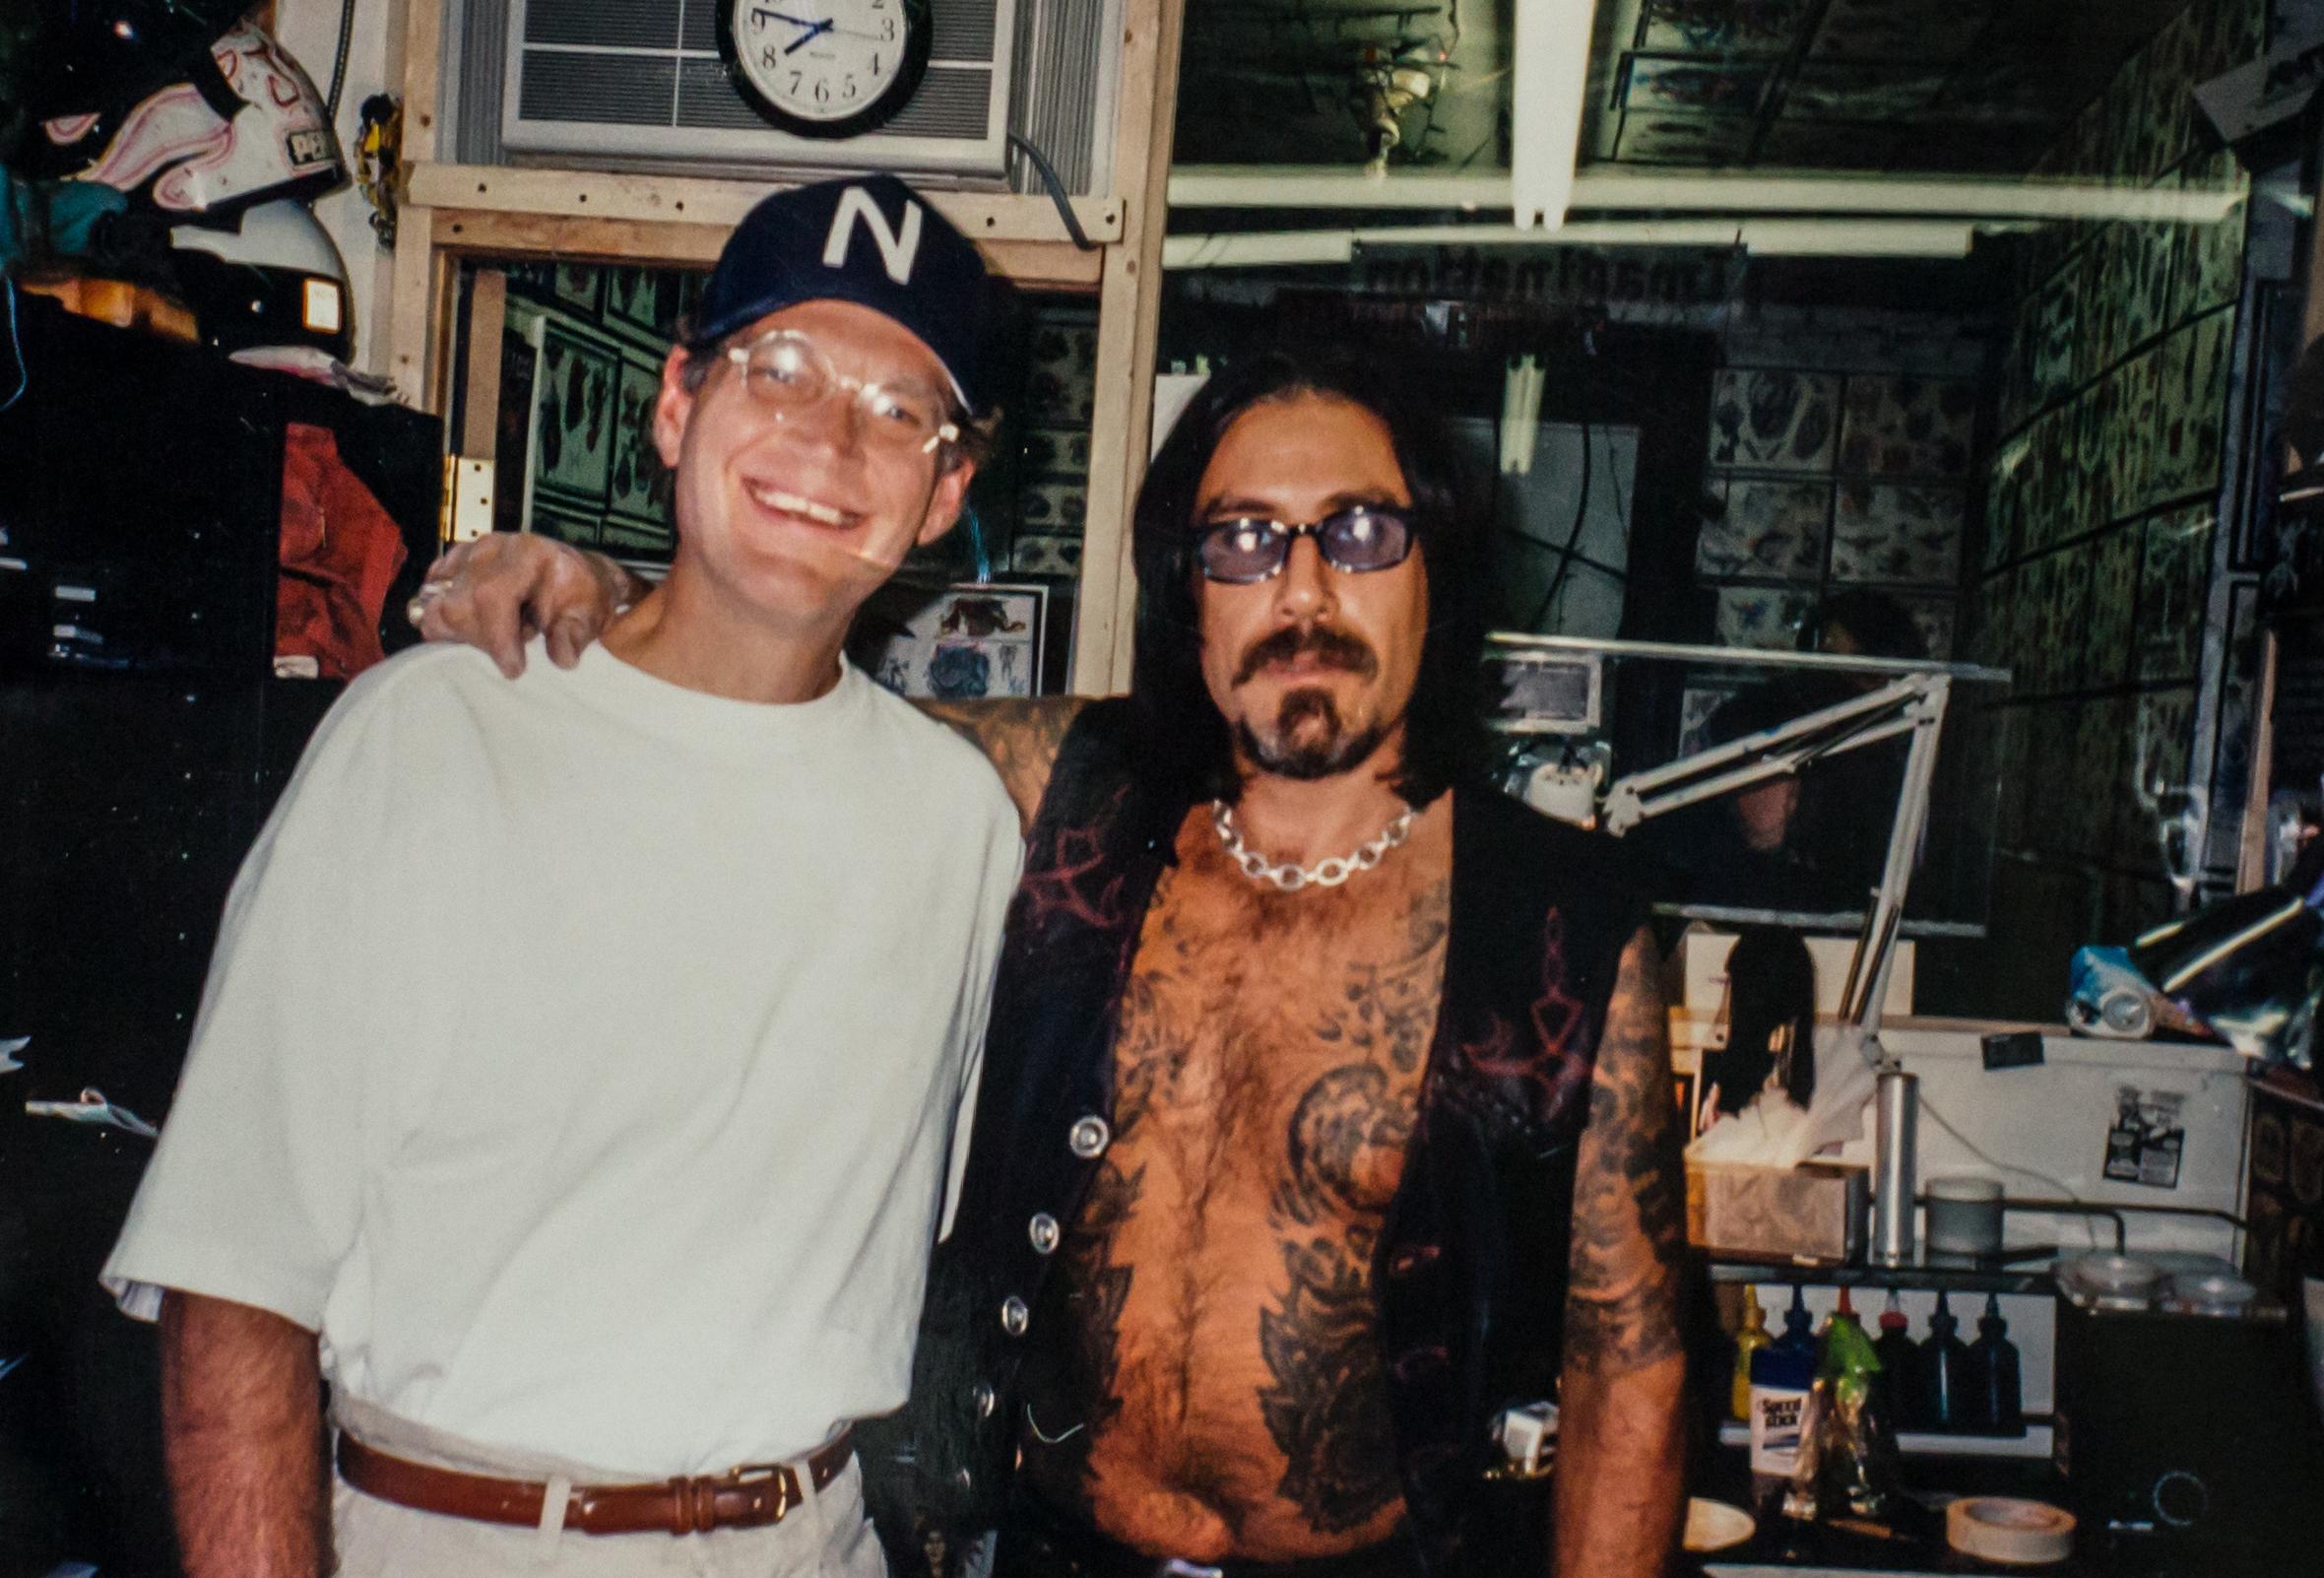 With david letterman @ funcity tattoo nyc, circa 1990